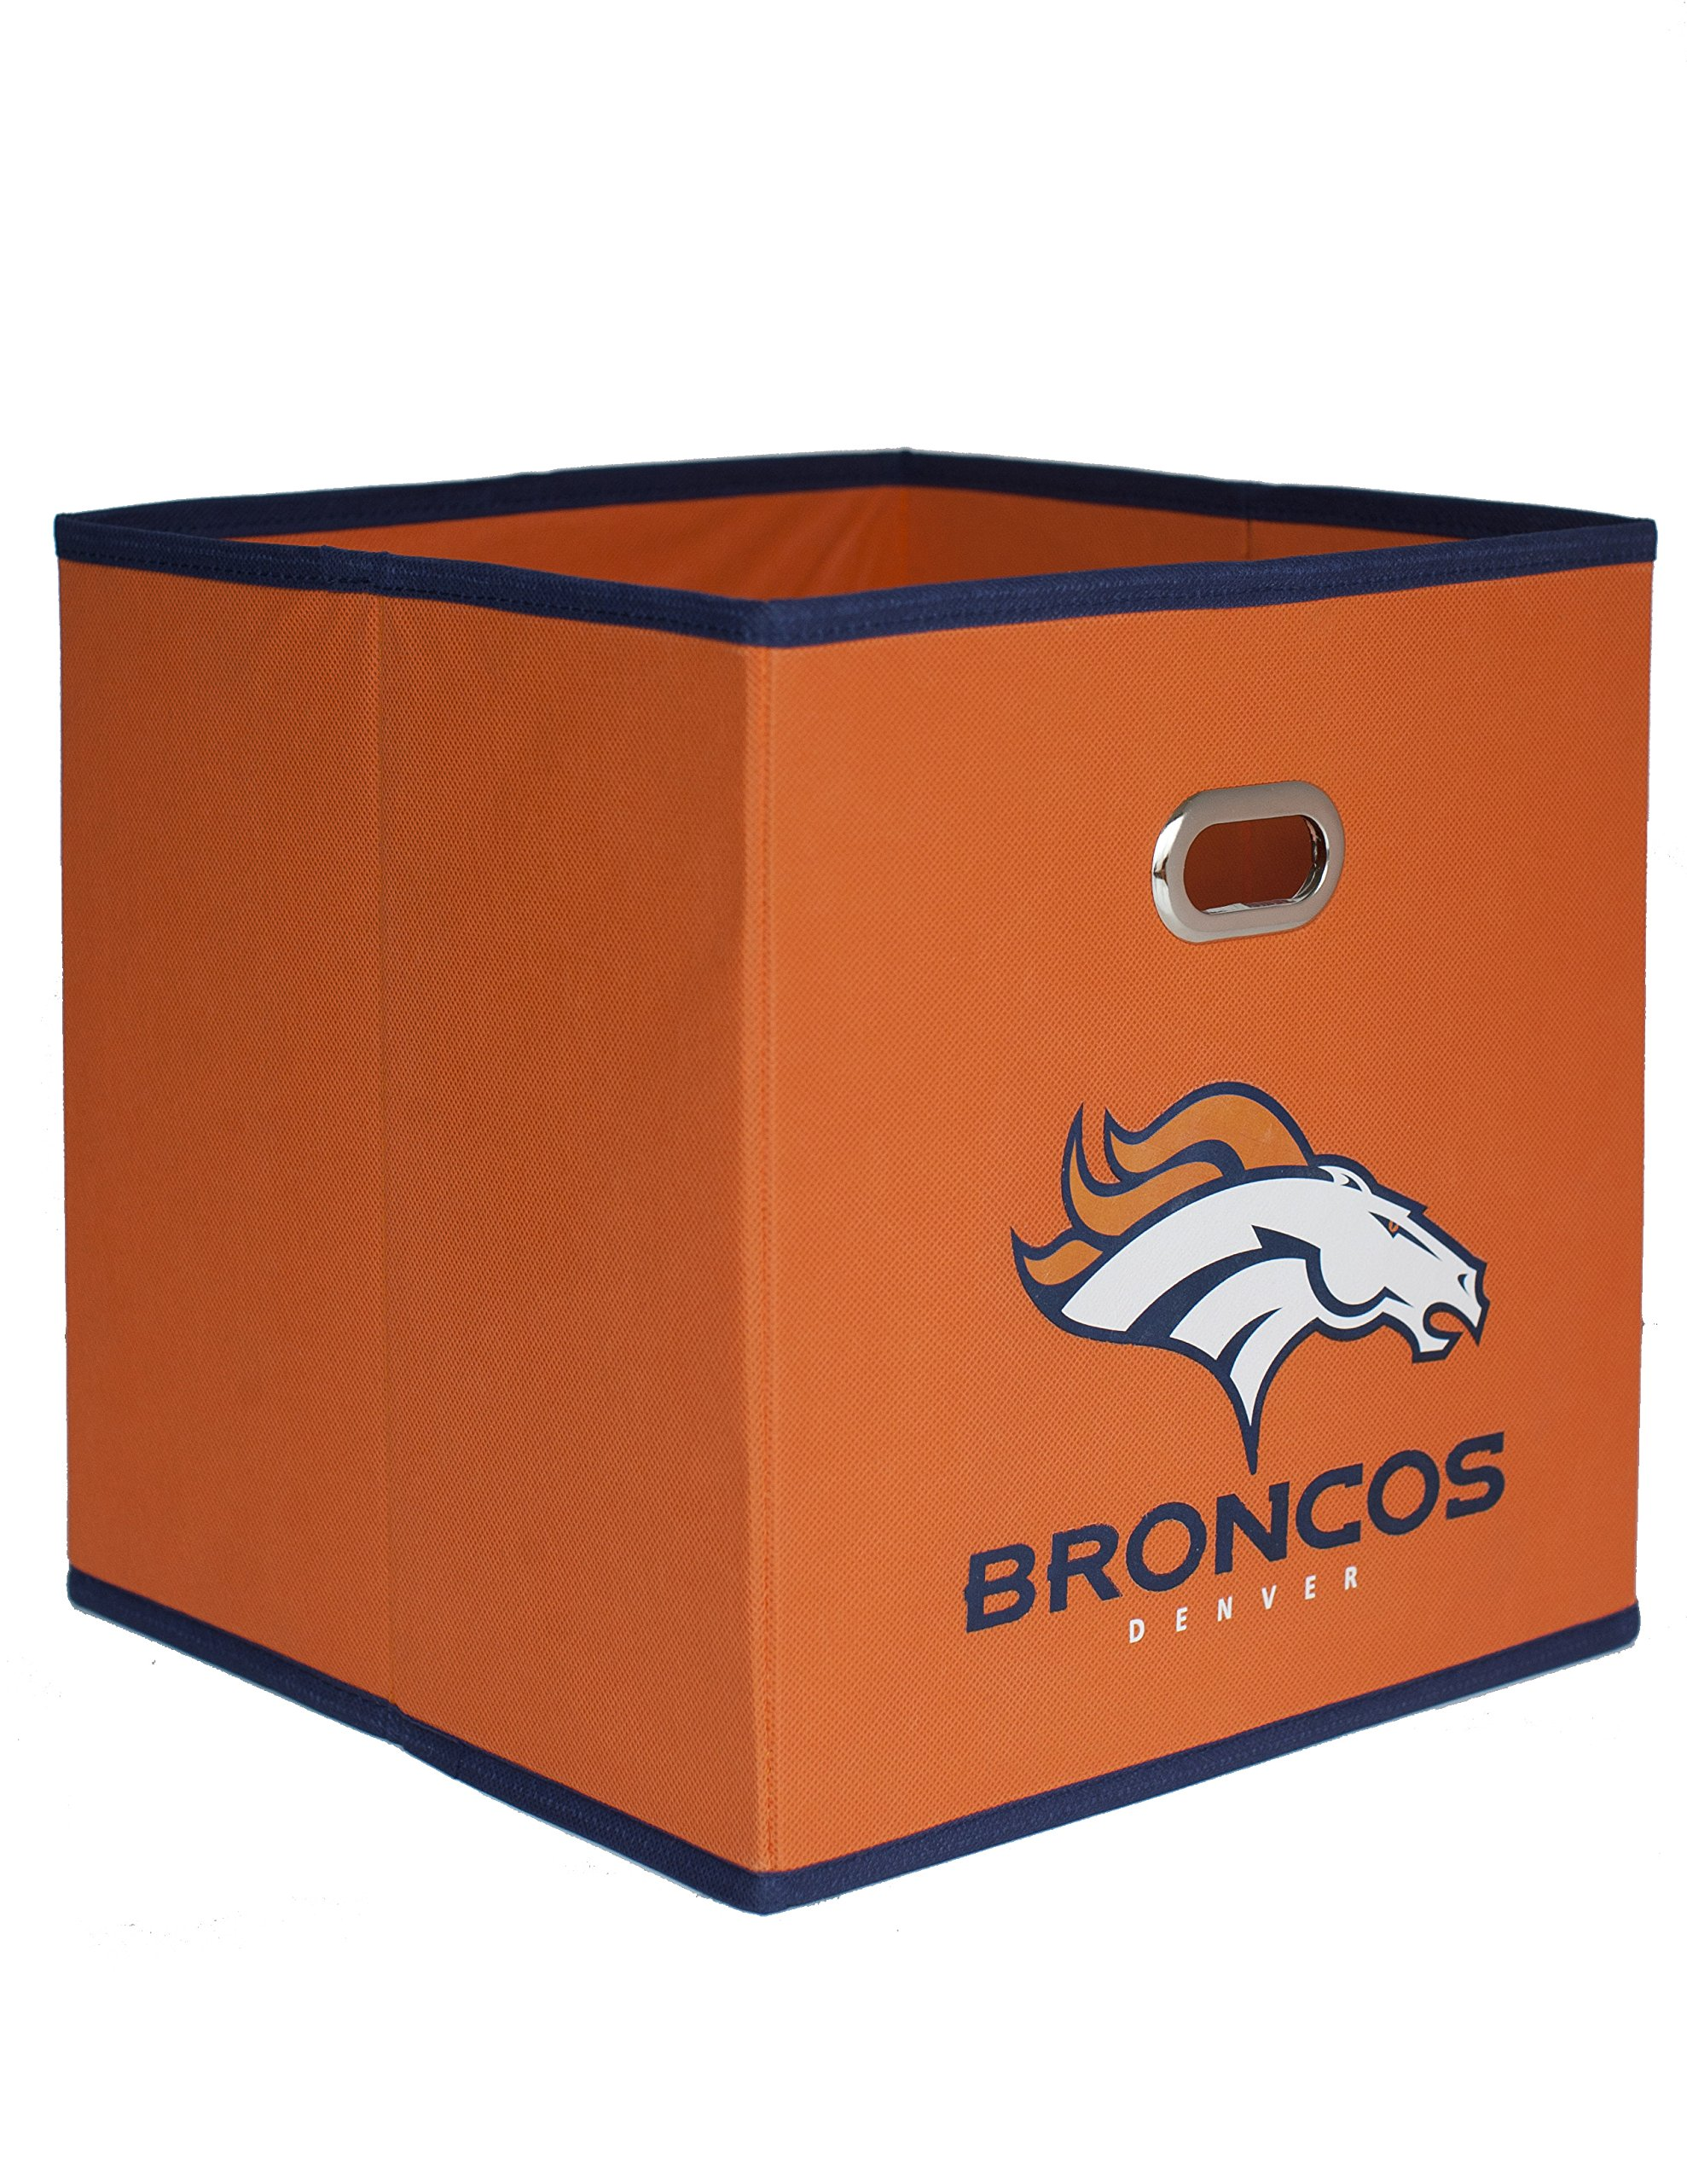 NFL Denver Broncos Fabric Storage Bin, 11 X 11 Inches, Orange    11000 009DEN U003c Décor U003c Sports U0026 Outdoors   TIBS